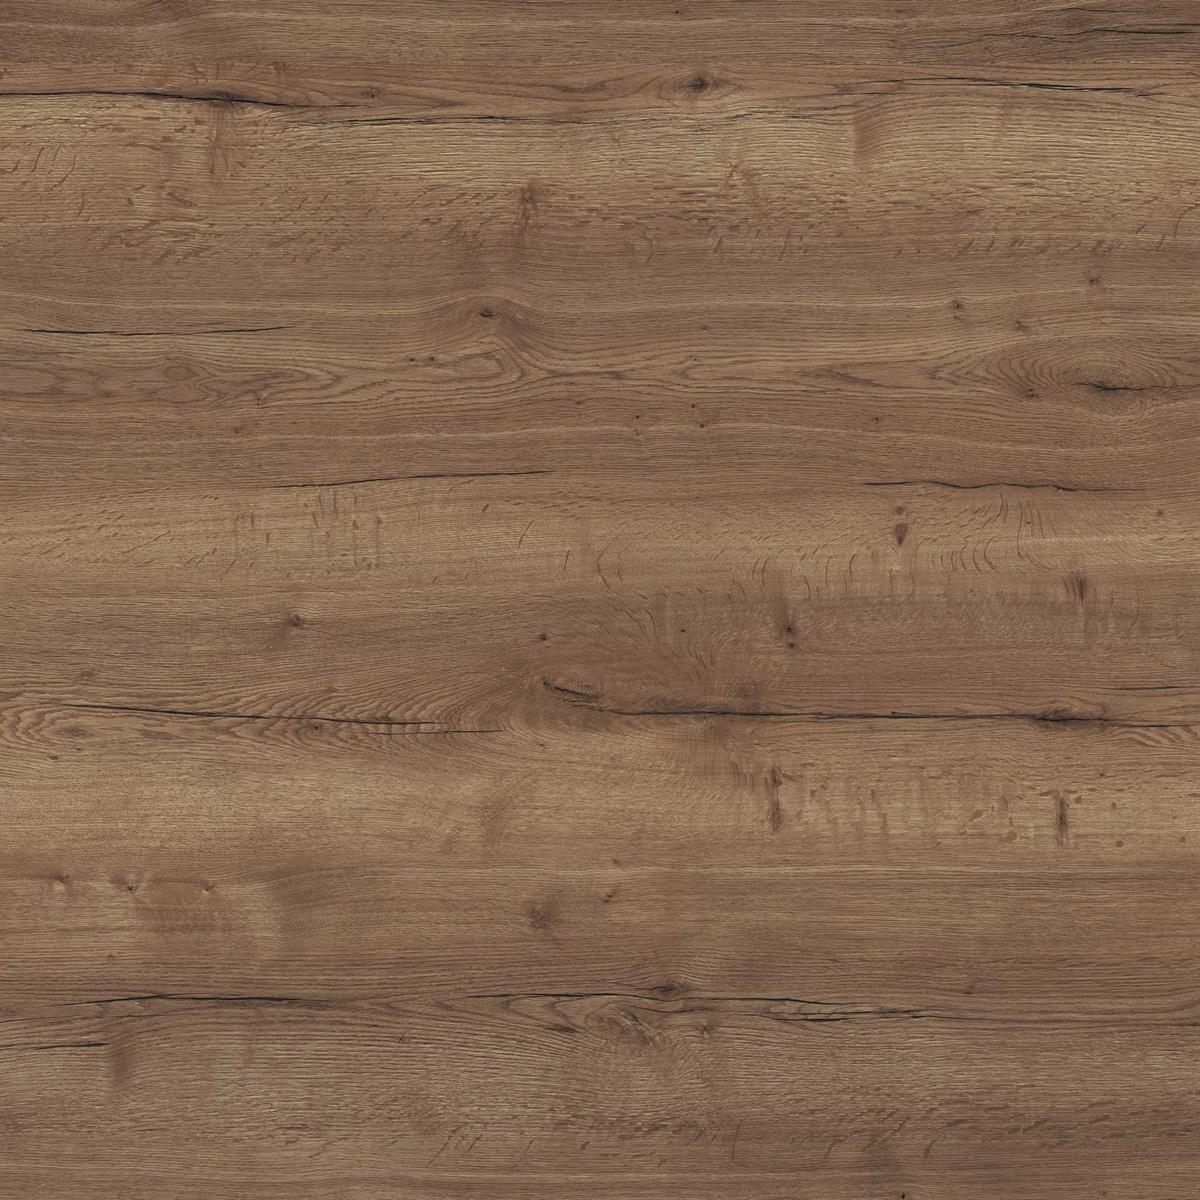 egger premium tobacco halifax oak a unique choice. Black Bedroom Furniture Sets. Home Design Ideas